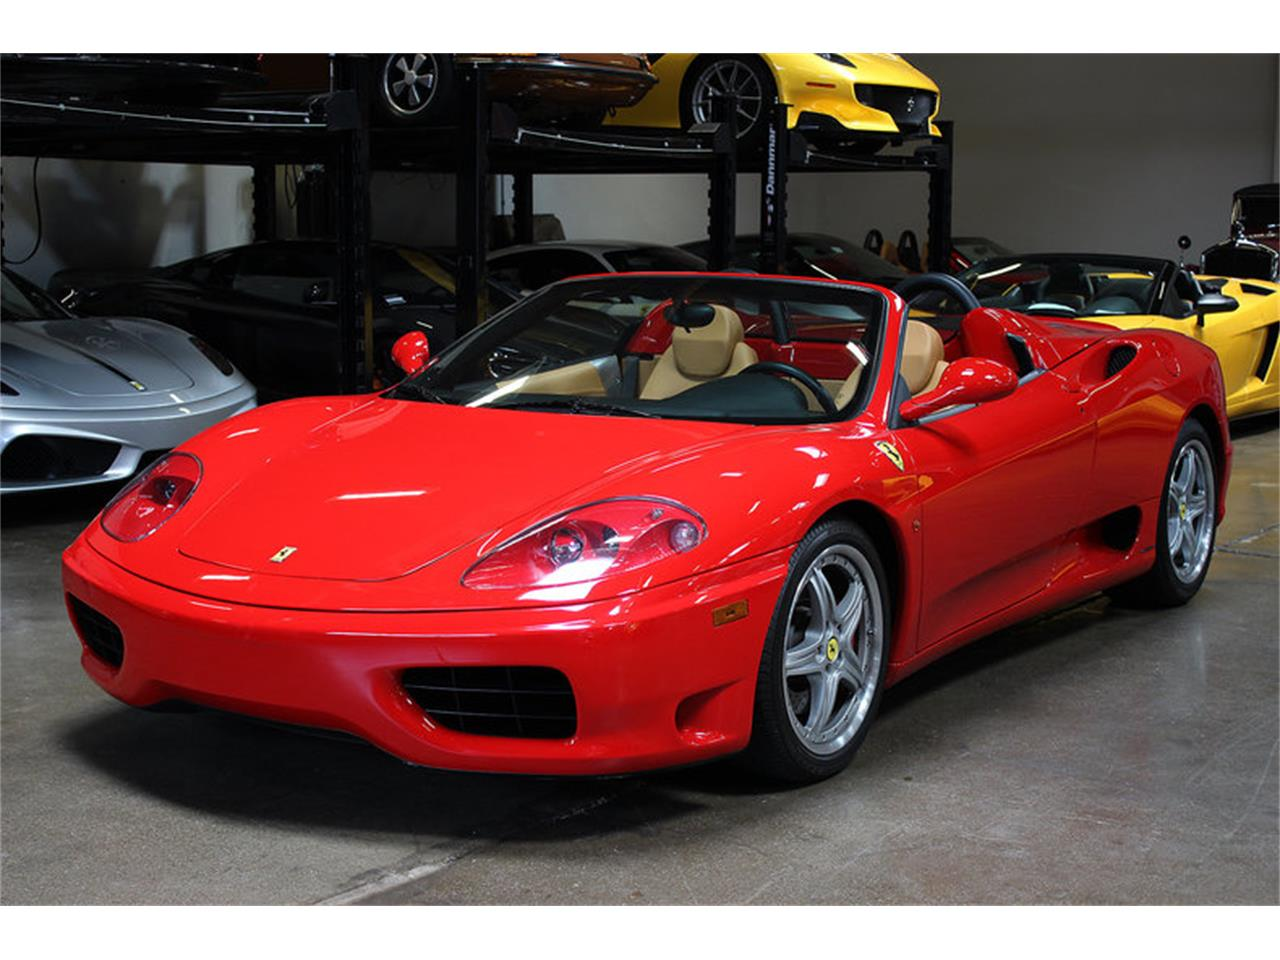 Large Picture of 2004 Ferrari 360 located in San Carlos California - $149,995.00 - LSDU